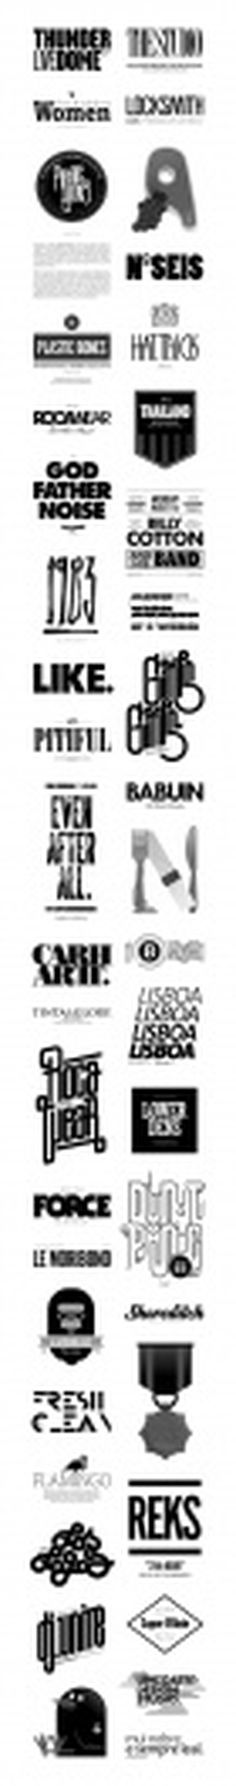 6ºRound on Typography Served #type #illustration #logo